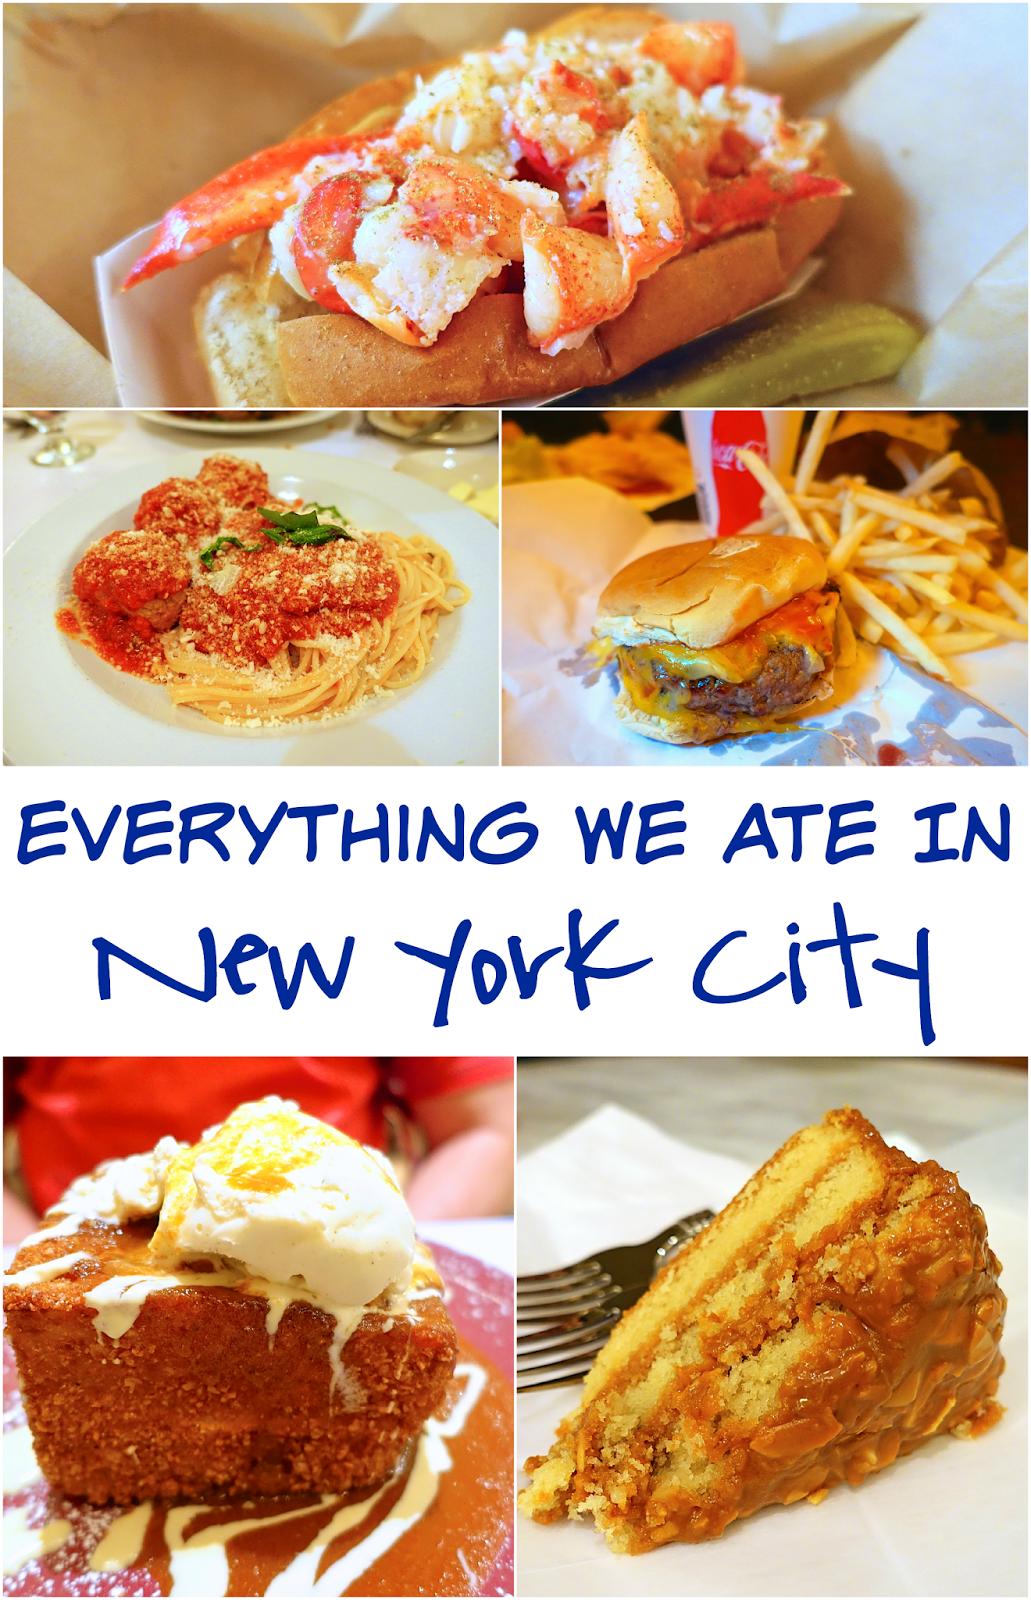 Everything We Ate In New York City Patsy S Italian Restaurant Bull Bear Plaza Food Hall Secret Burger Joint Magnolia Bakery Norma Milk Bar